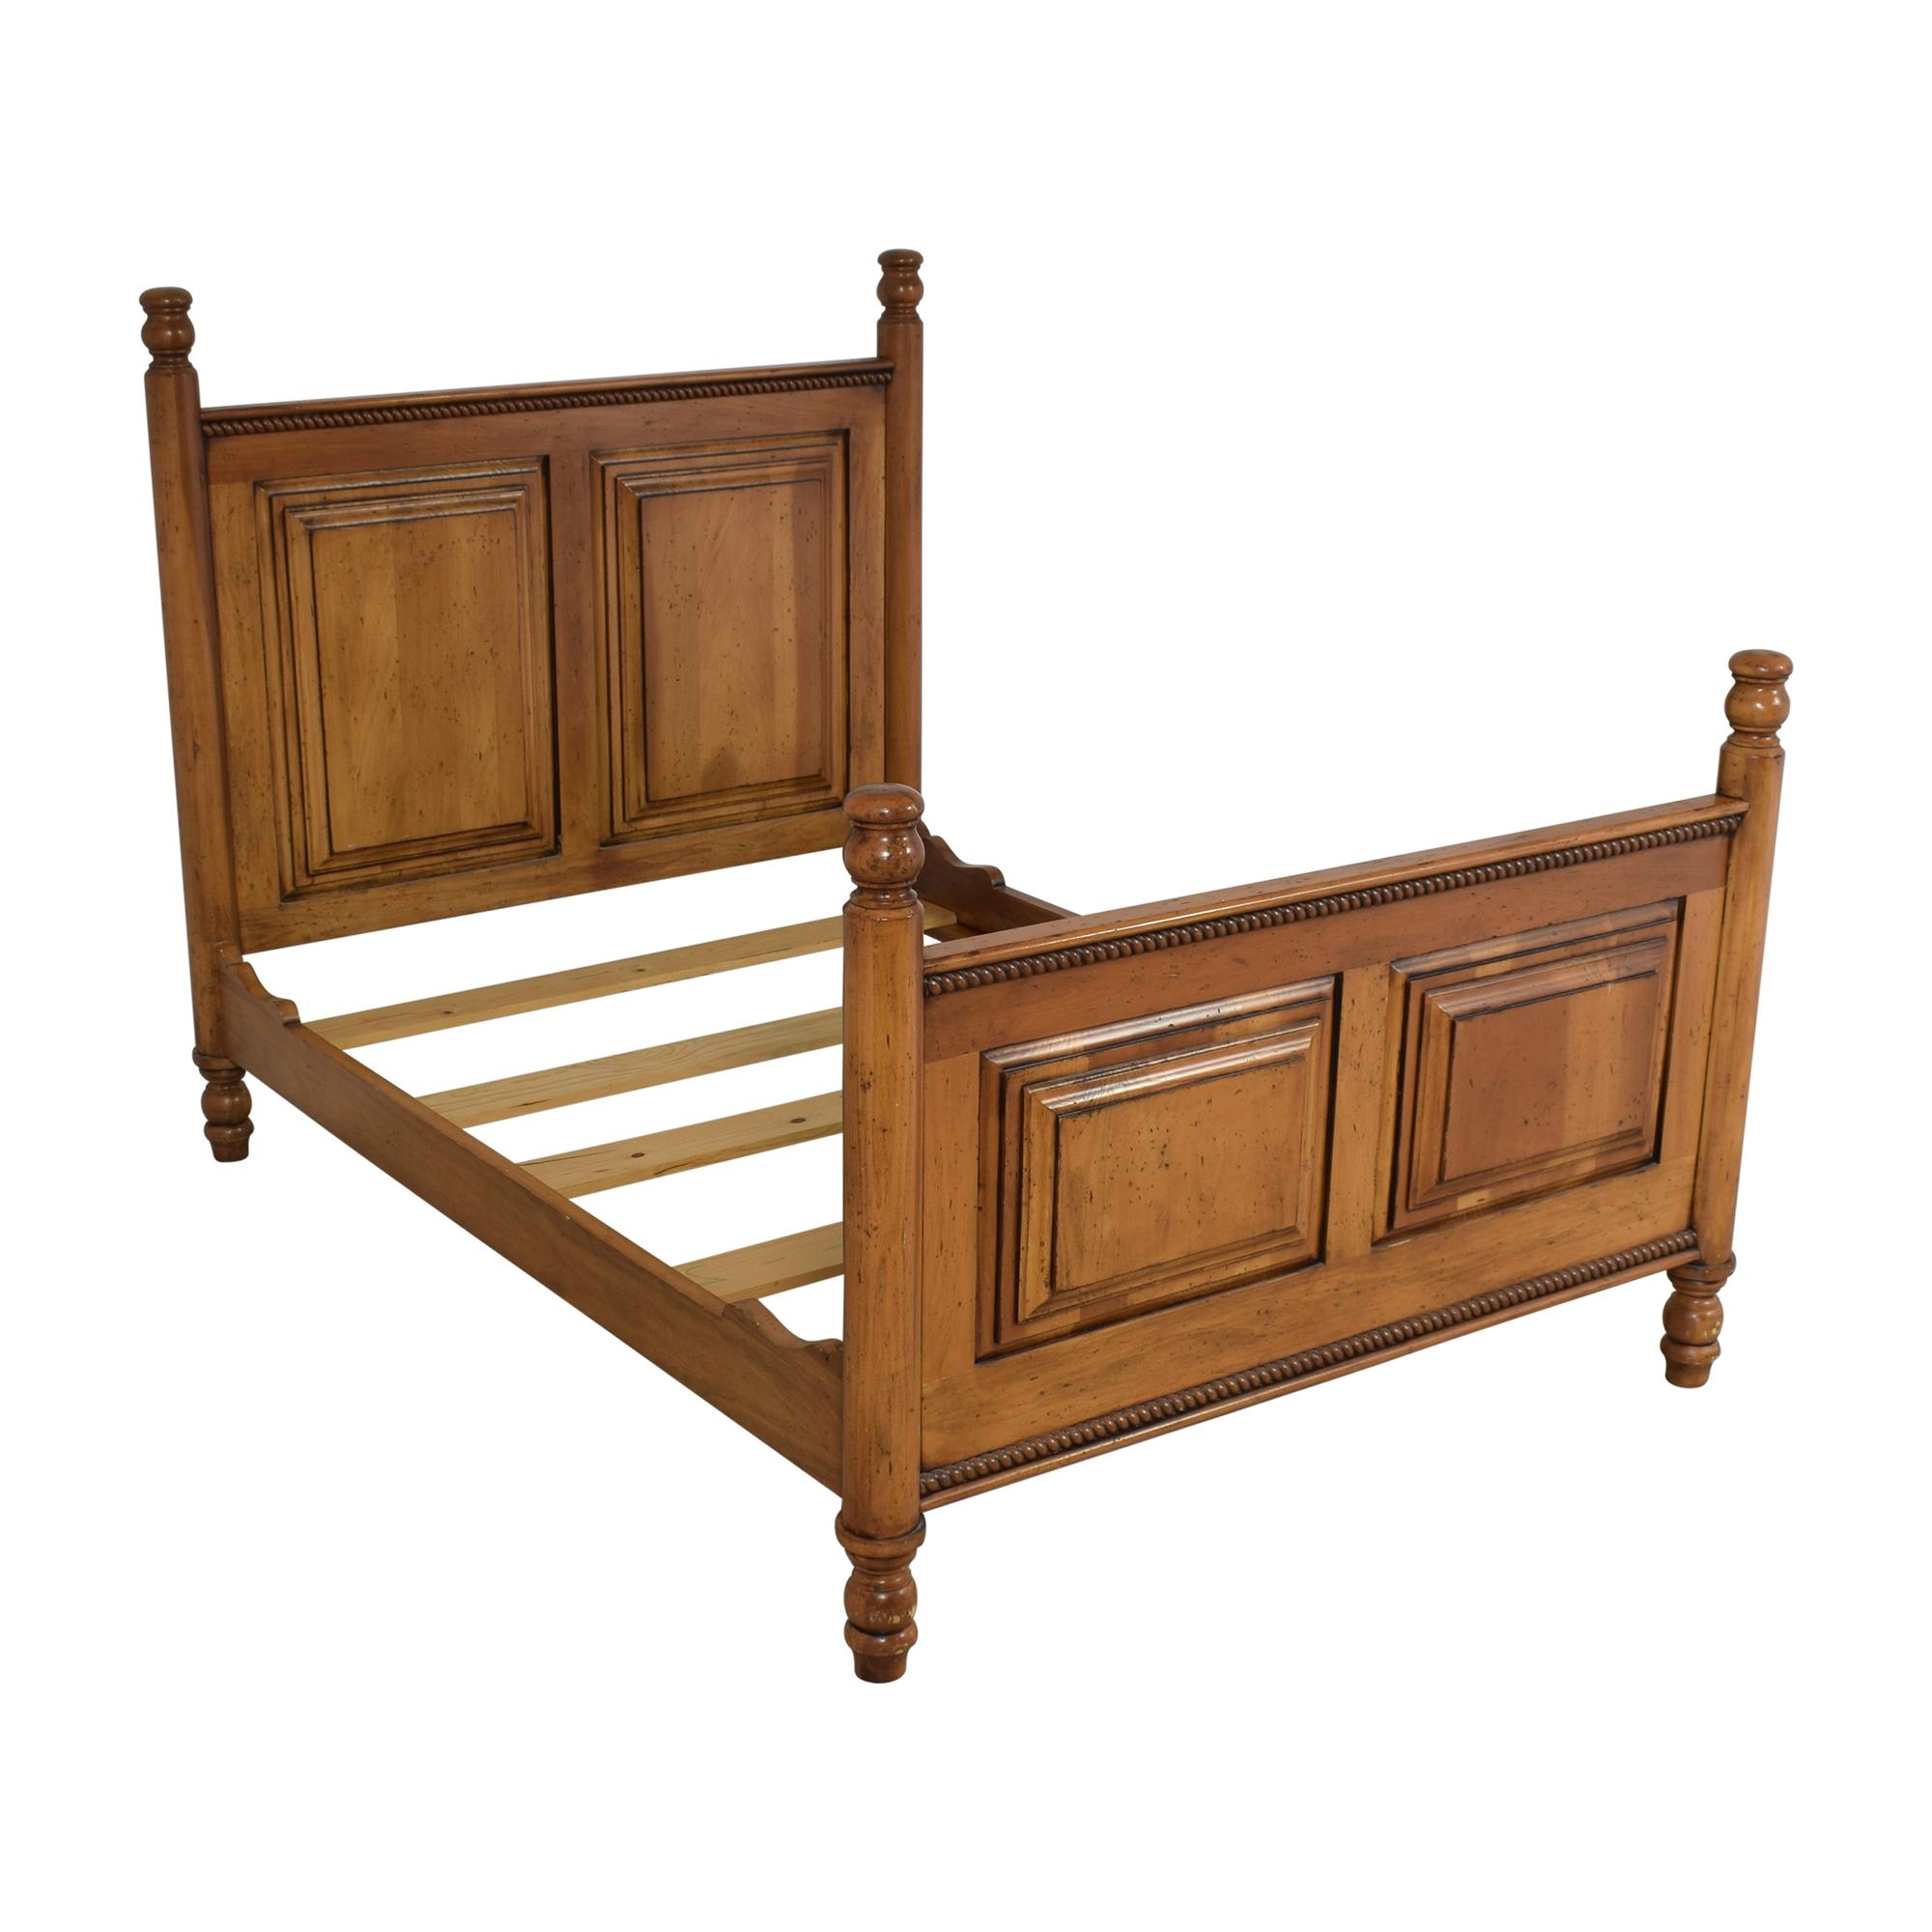 Weathered Aidan Full Bed